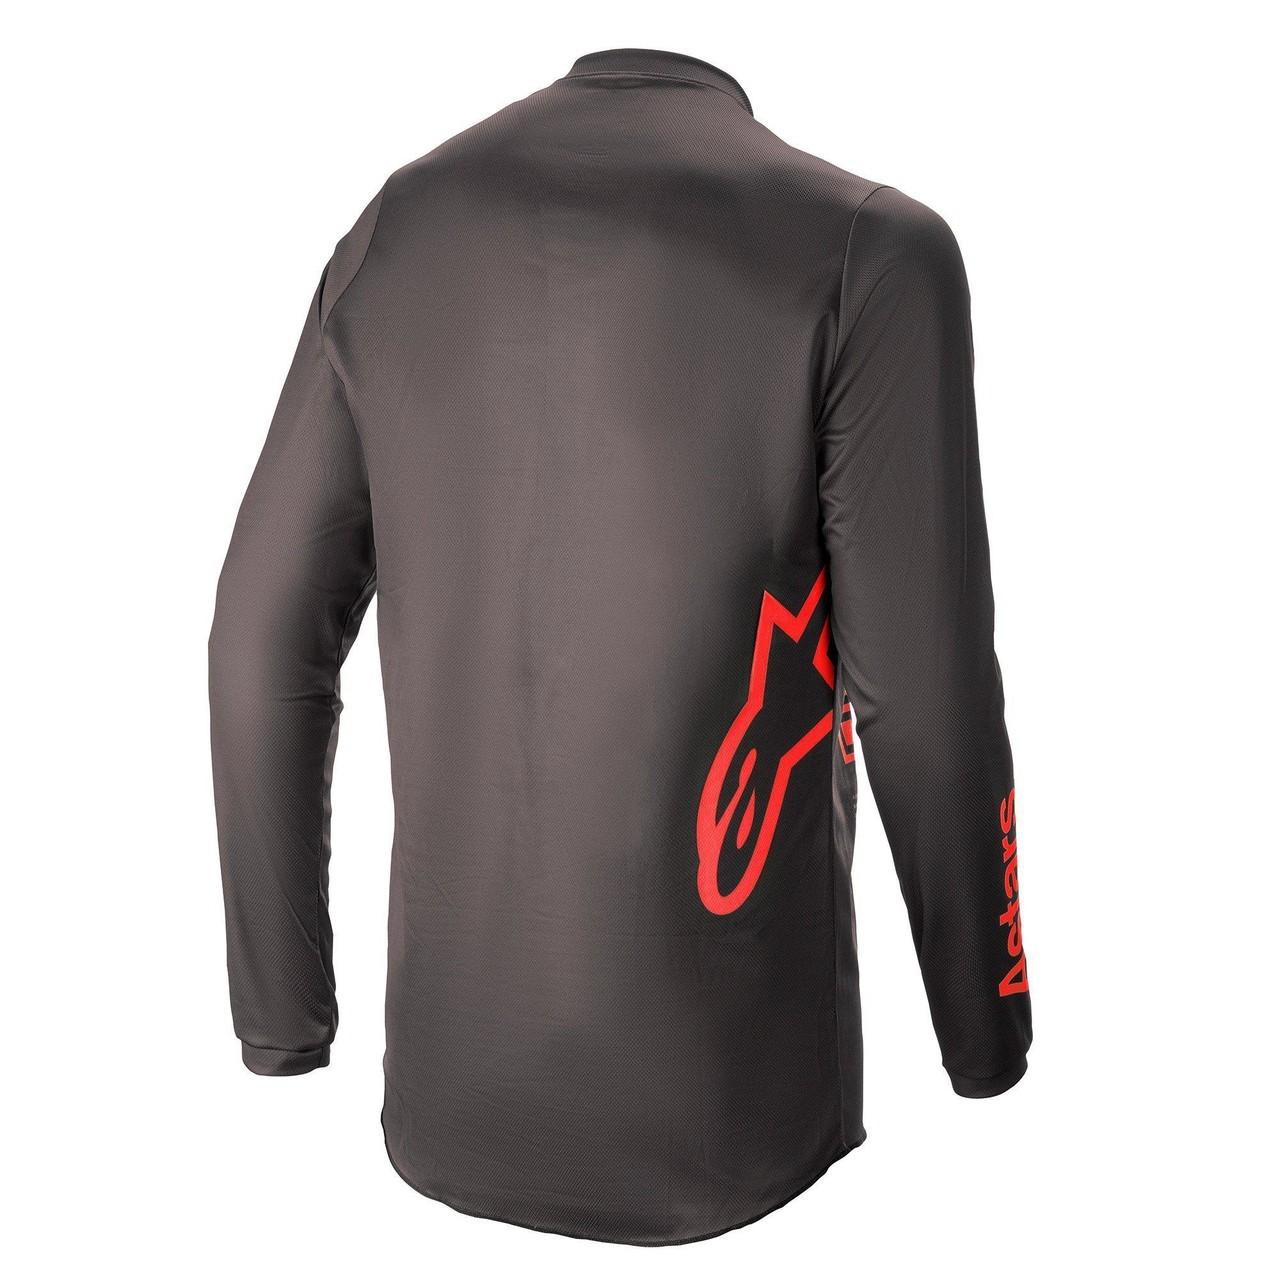 Kit Calça + Camisa Alpinestars Fluid Chaser